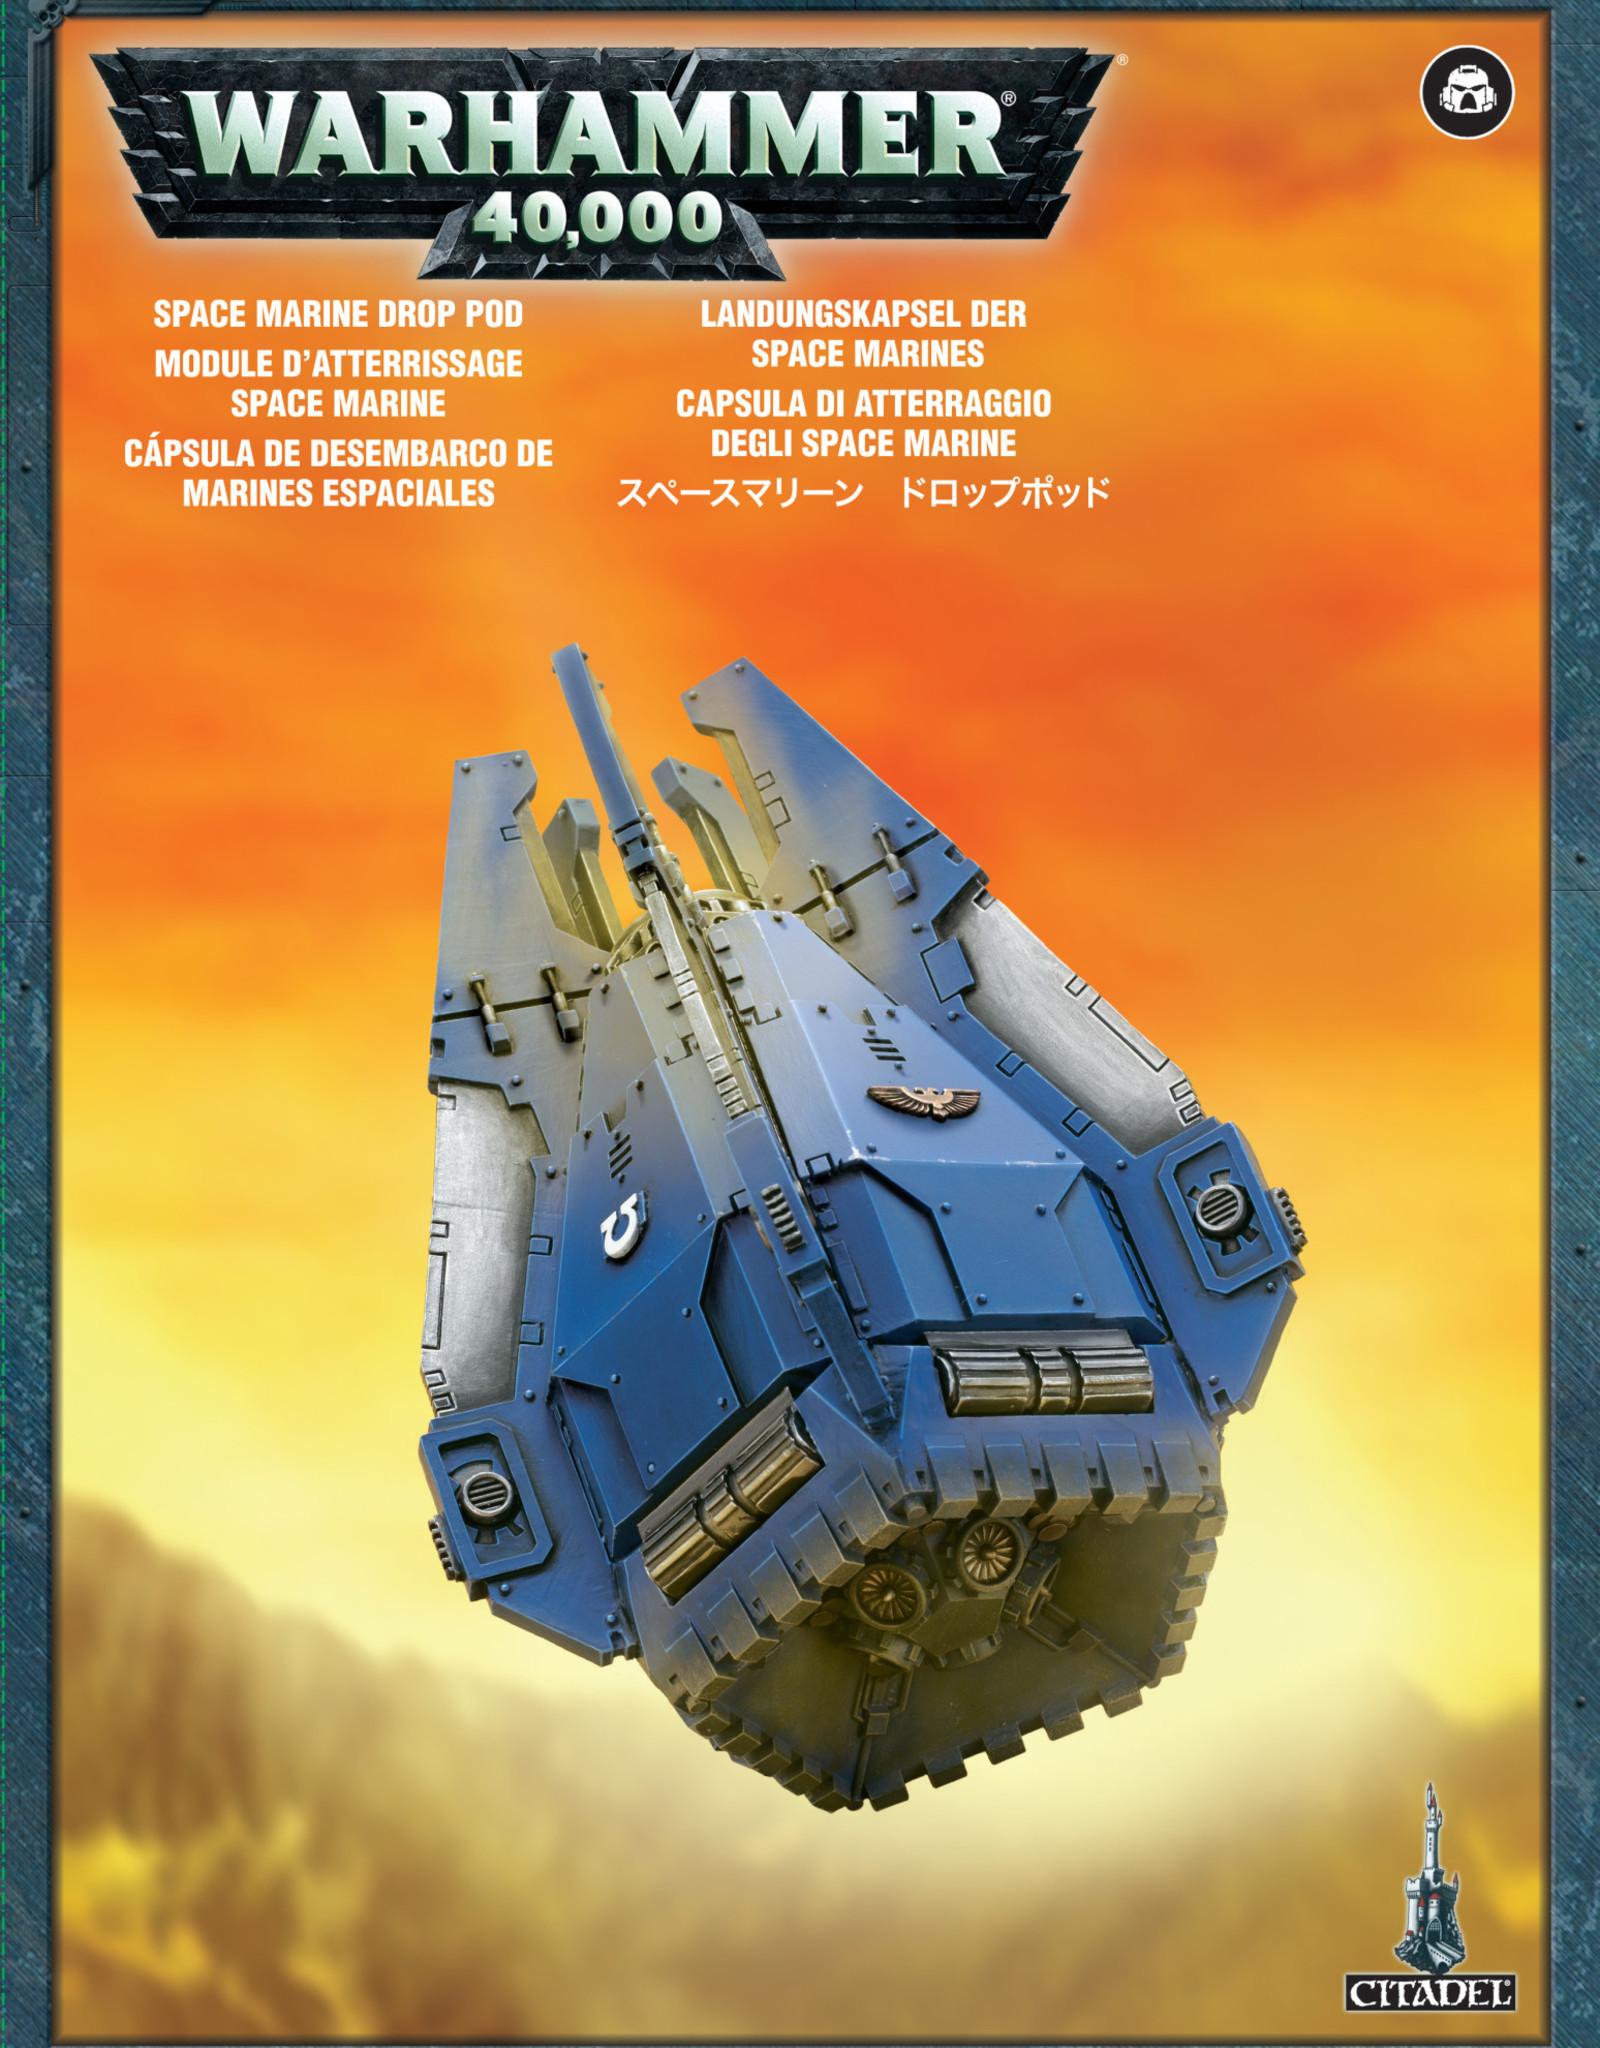 Warhammer 40K Space Marine Drop Pod